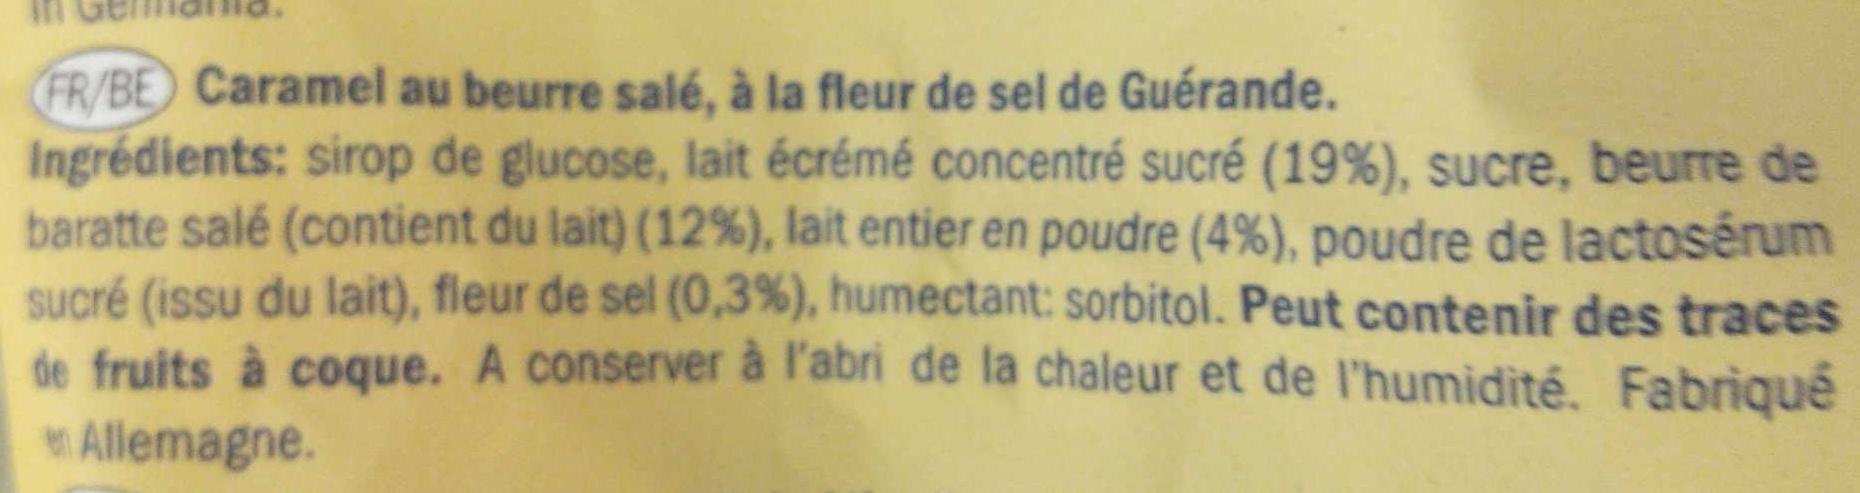 Butter Toffee - Ingrédients - fr